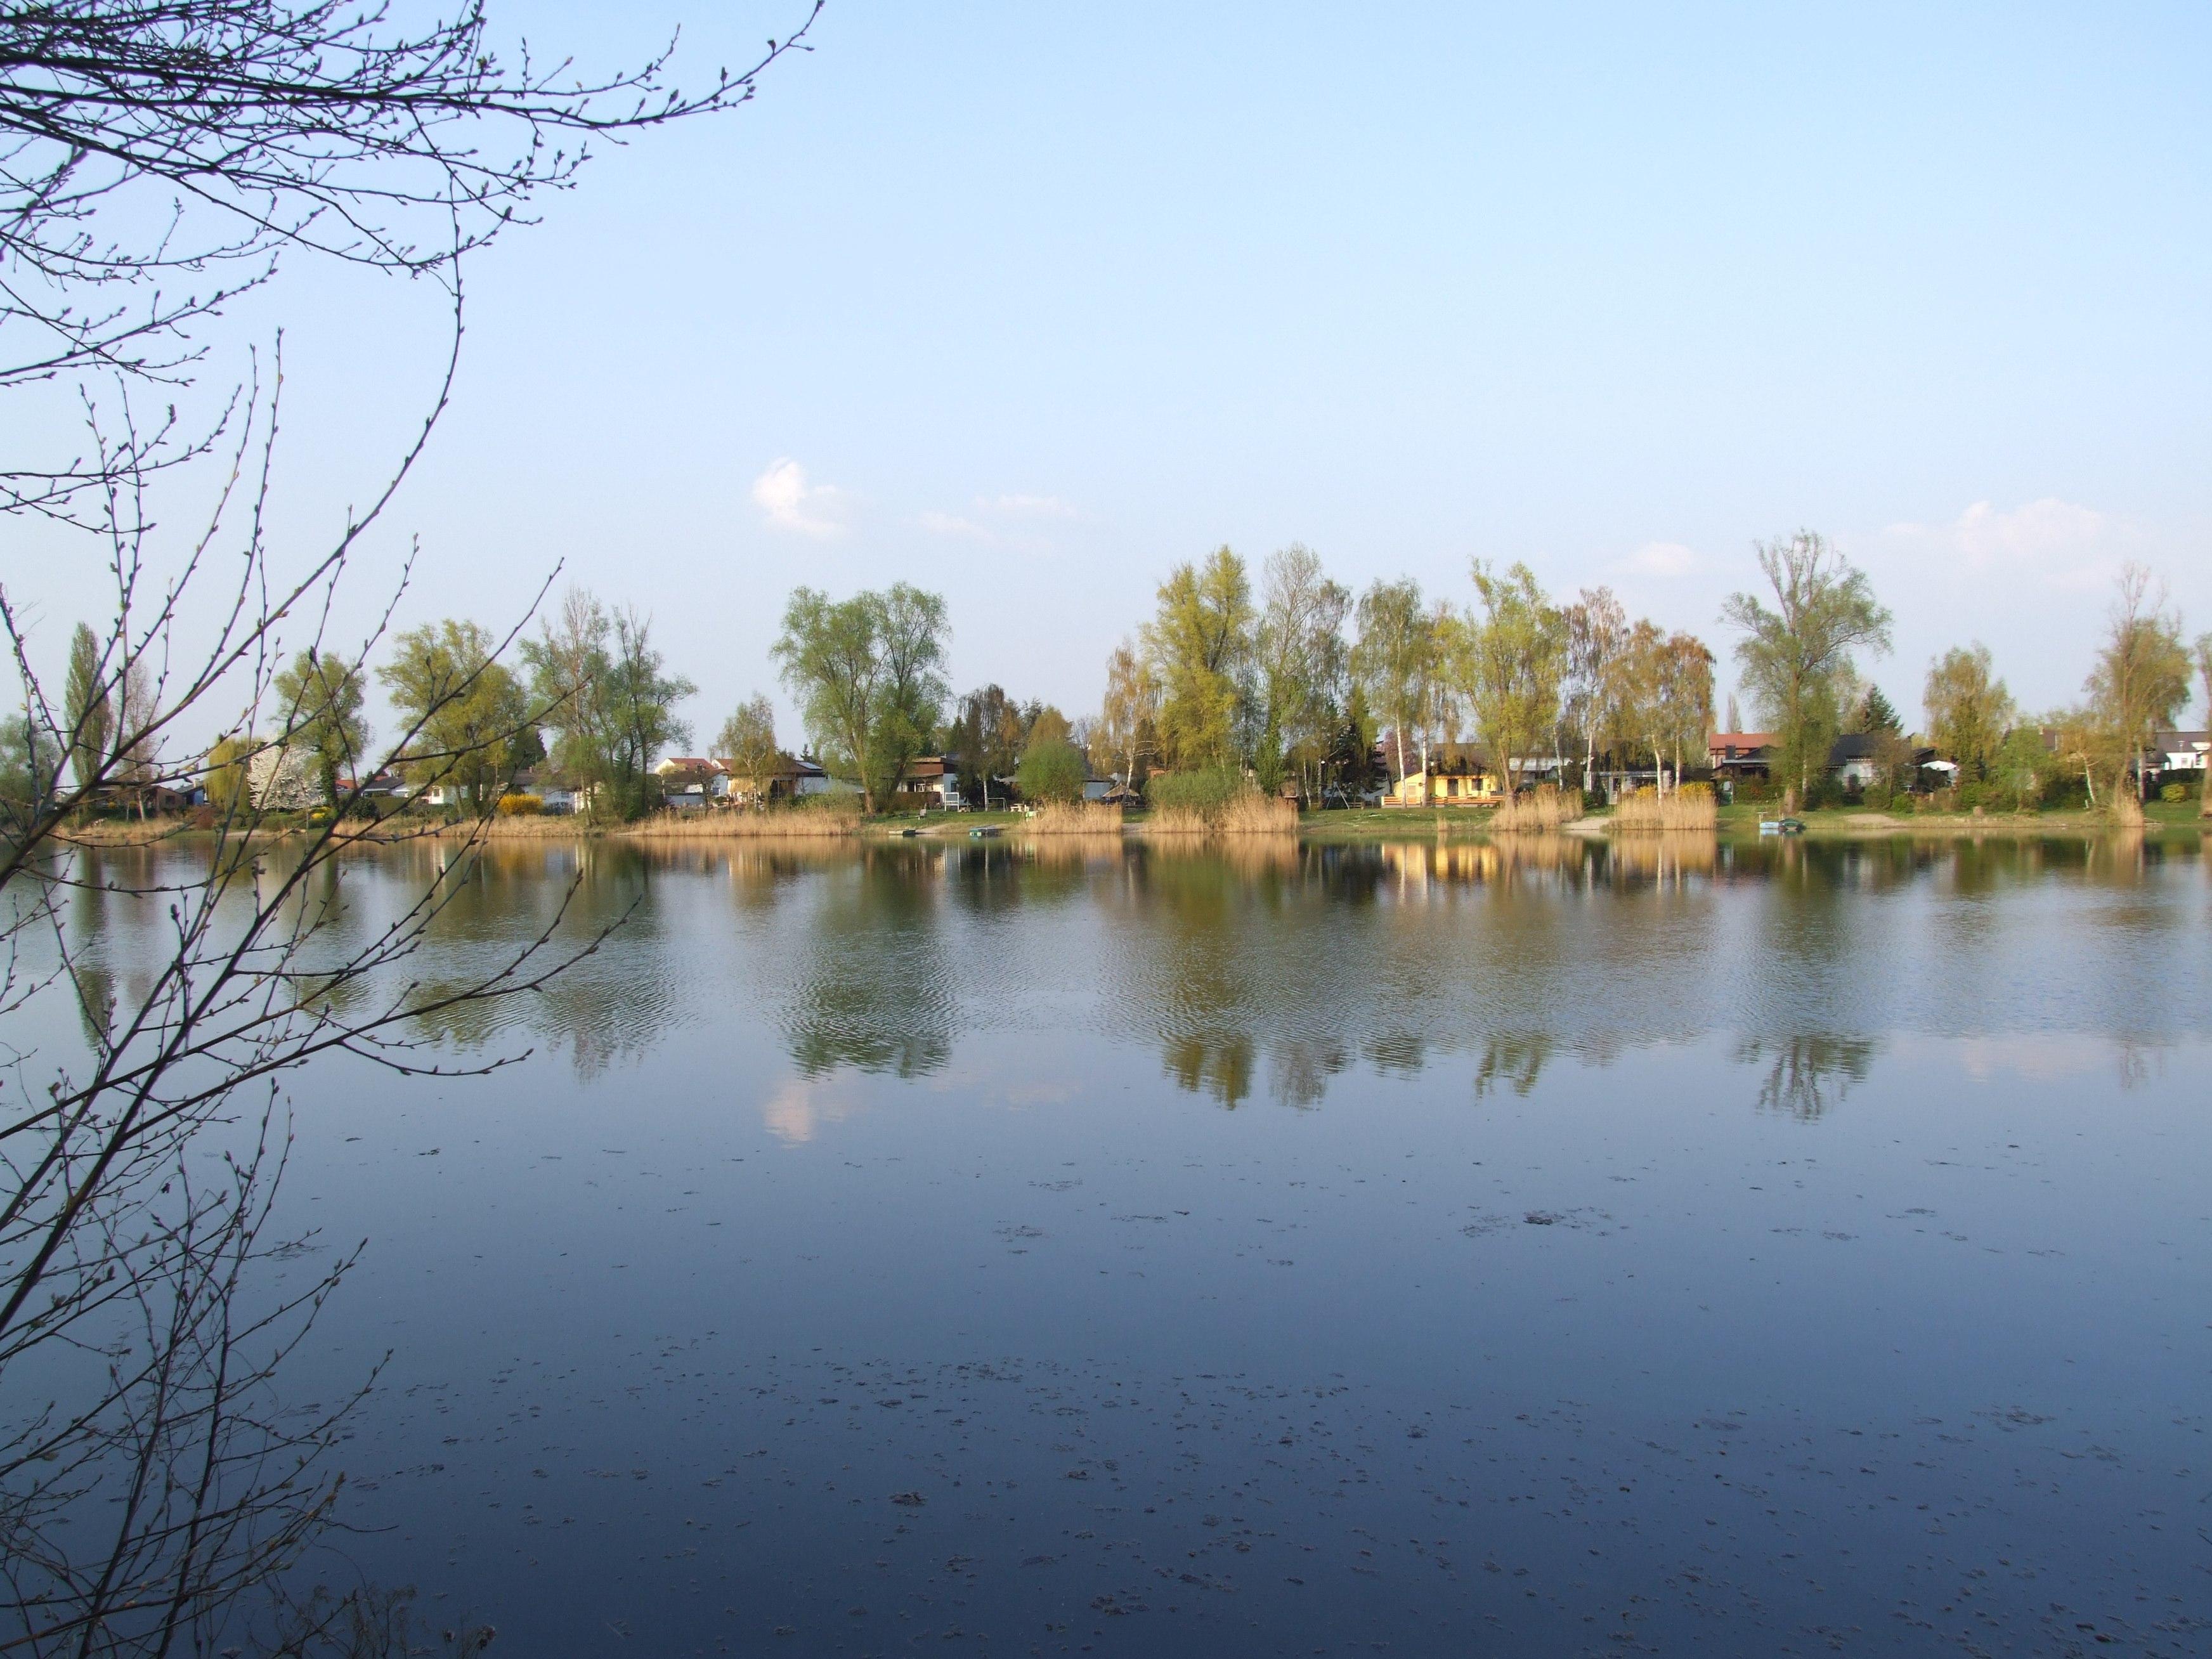 Fkk binsfeld Fkk See